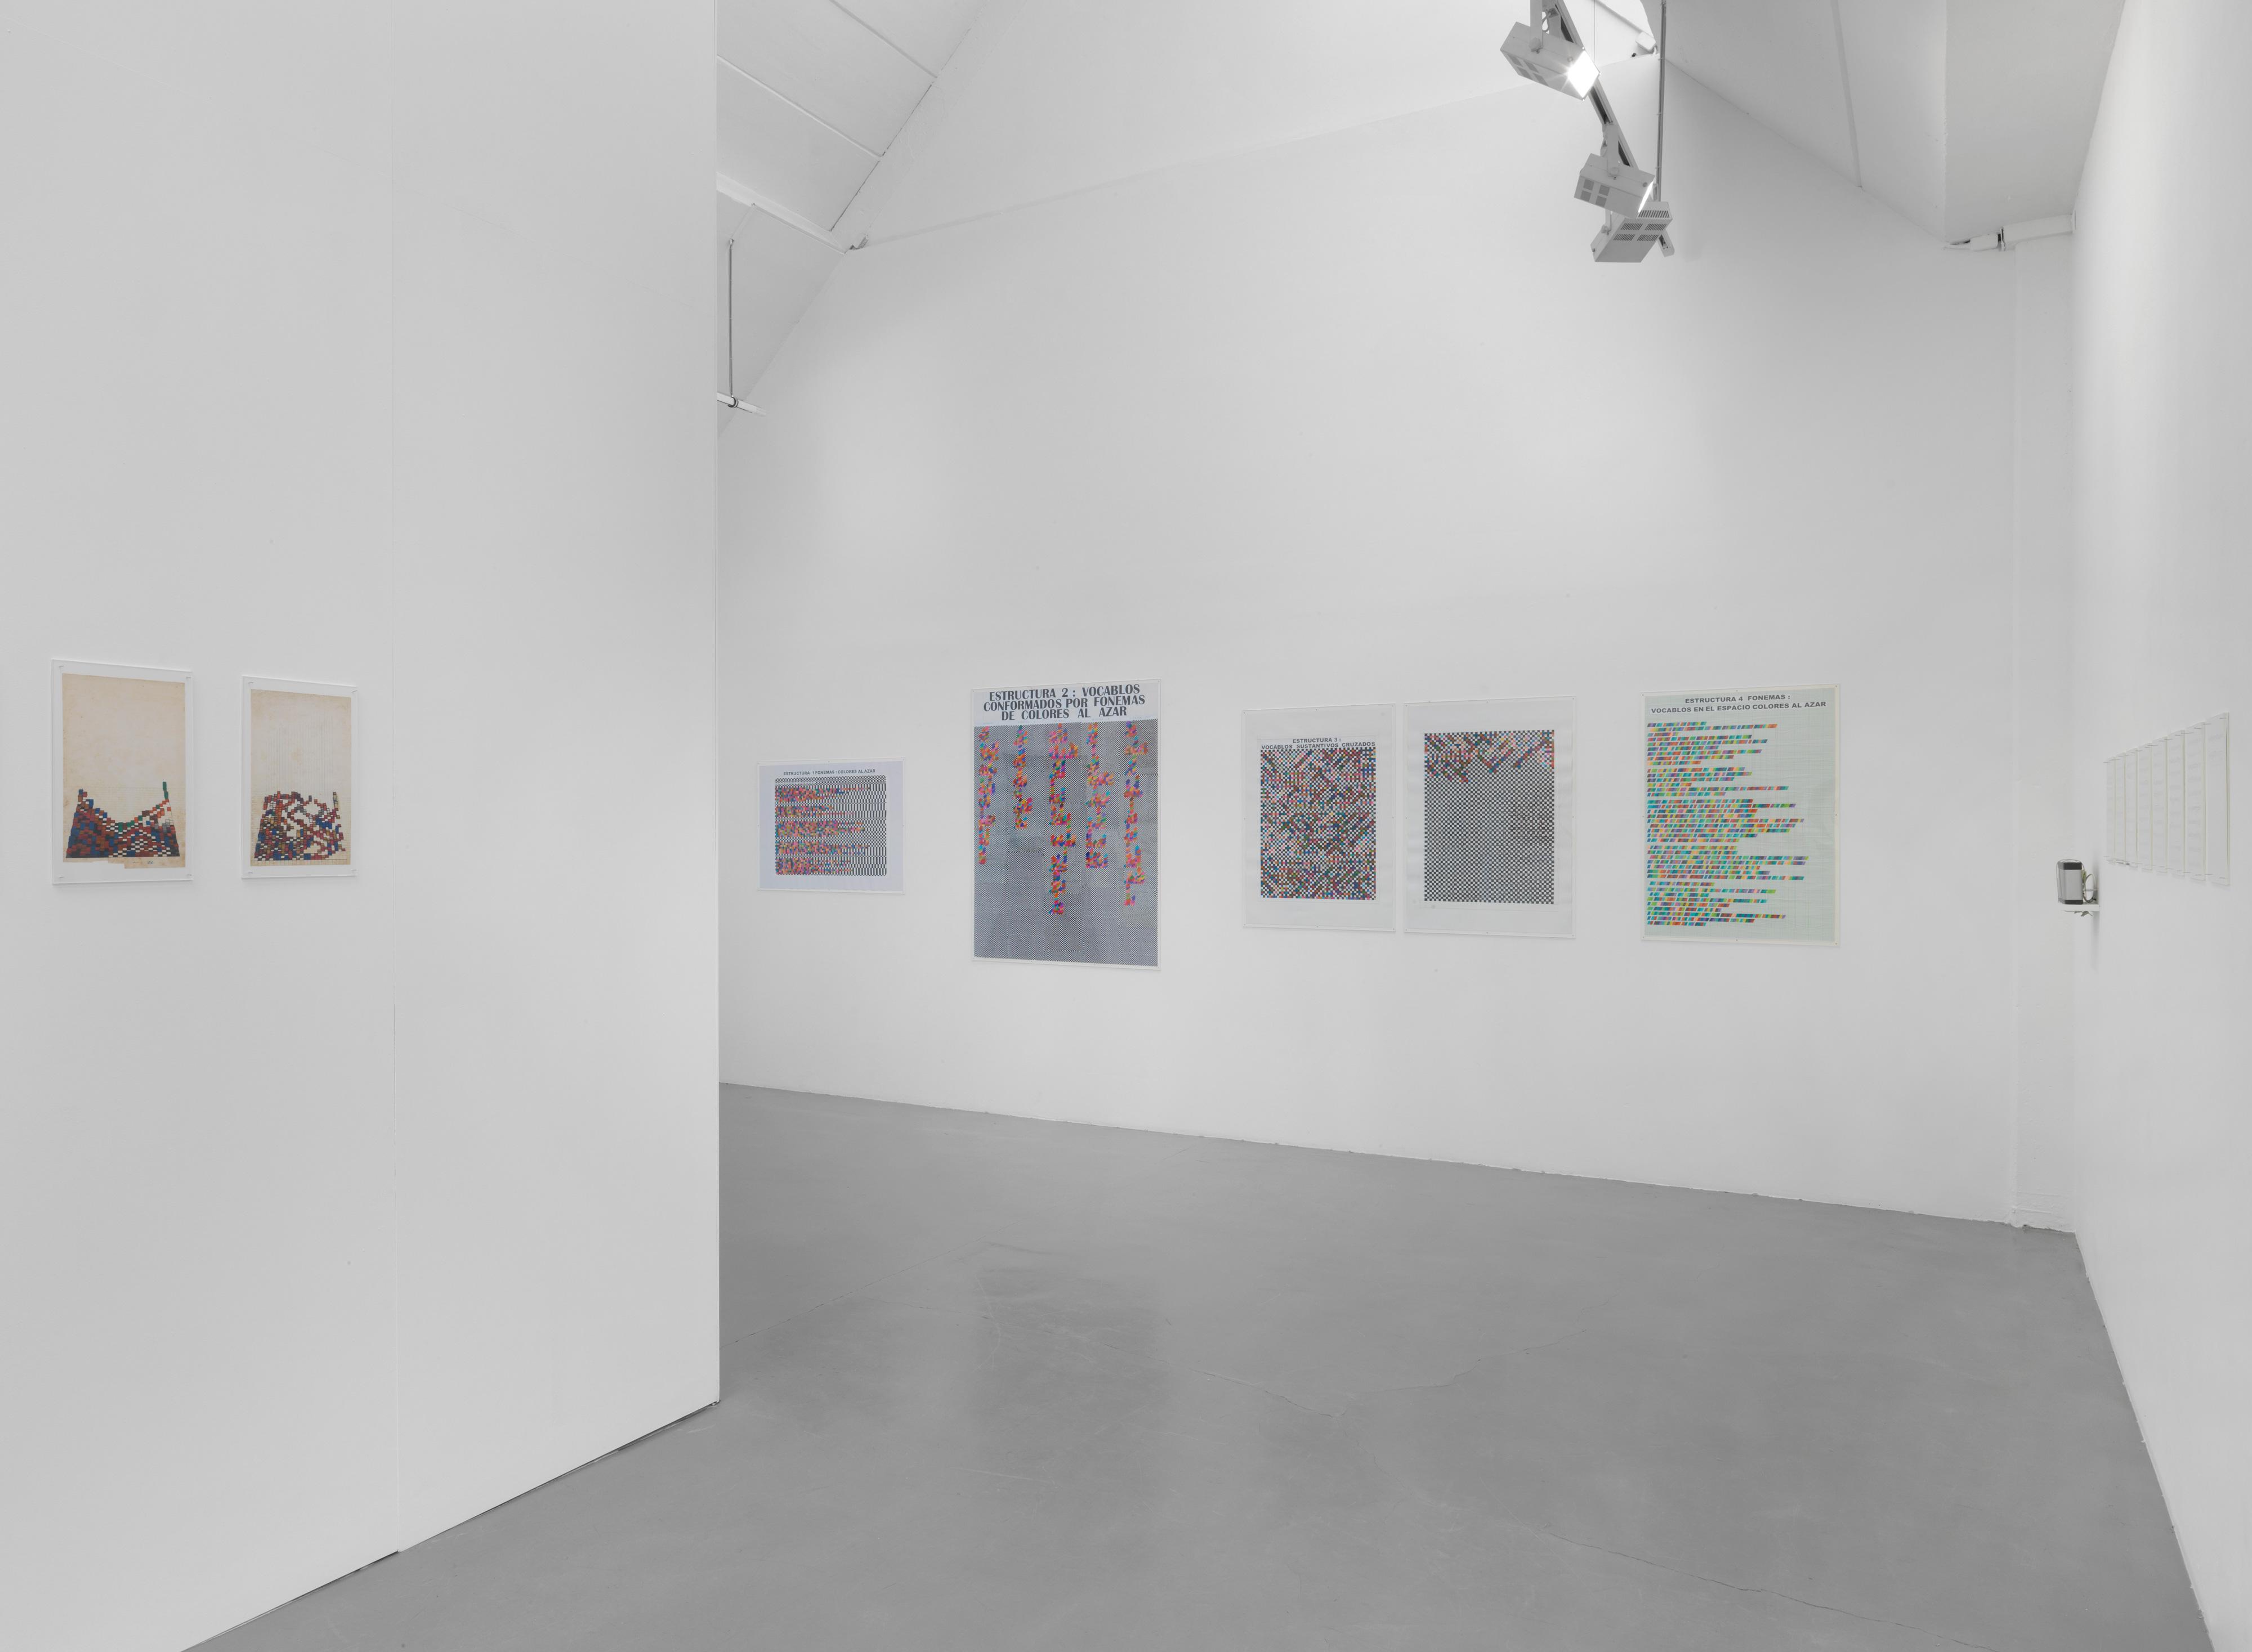 Galerie Barbara Thumm \ Teresa Burga – Conceptual Installations of the Seventies